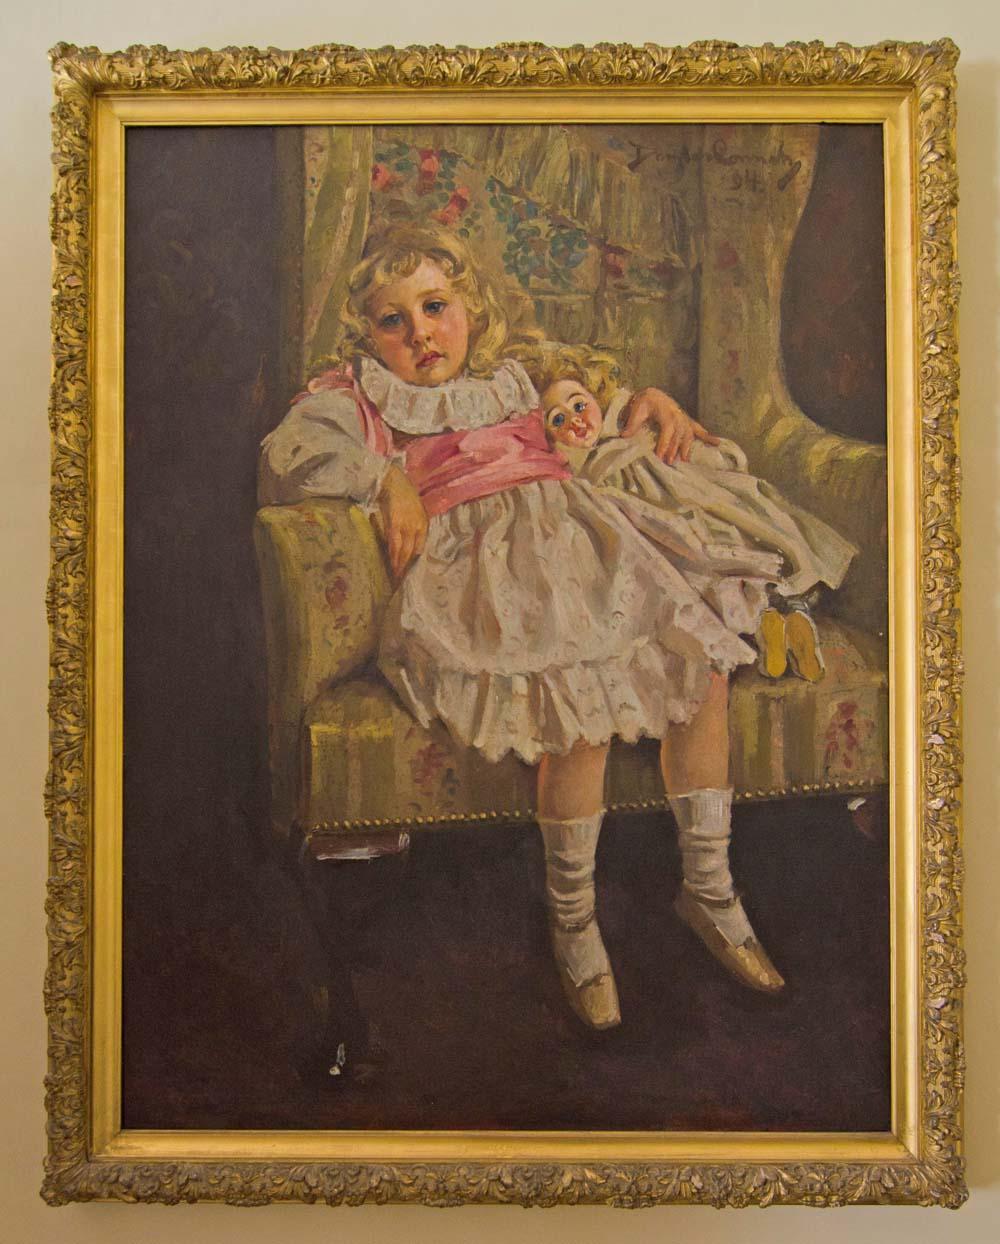 Portrait of Agatha Christie as a young girl at Greenway - copyright Alex Graeme, Unique Devon Tours Uini